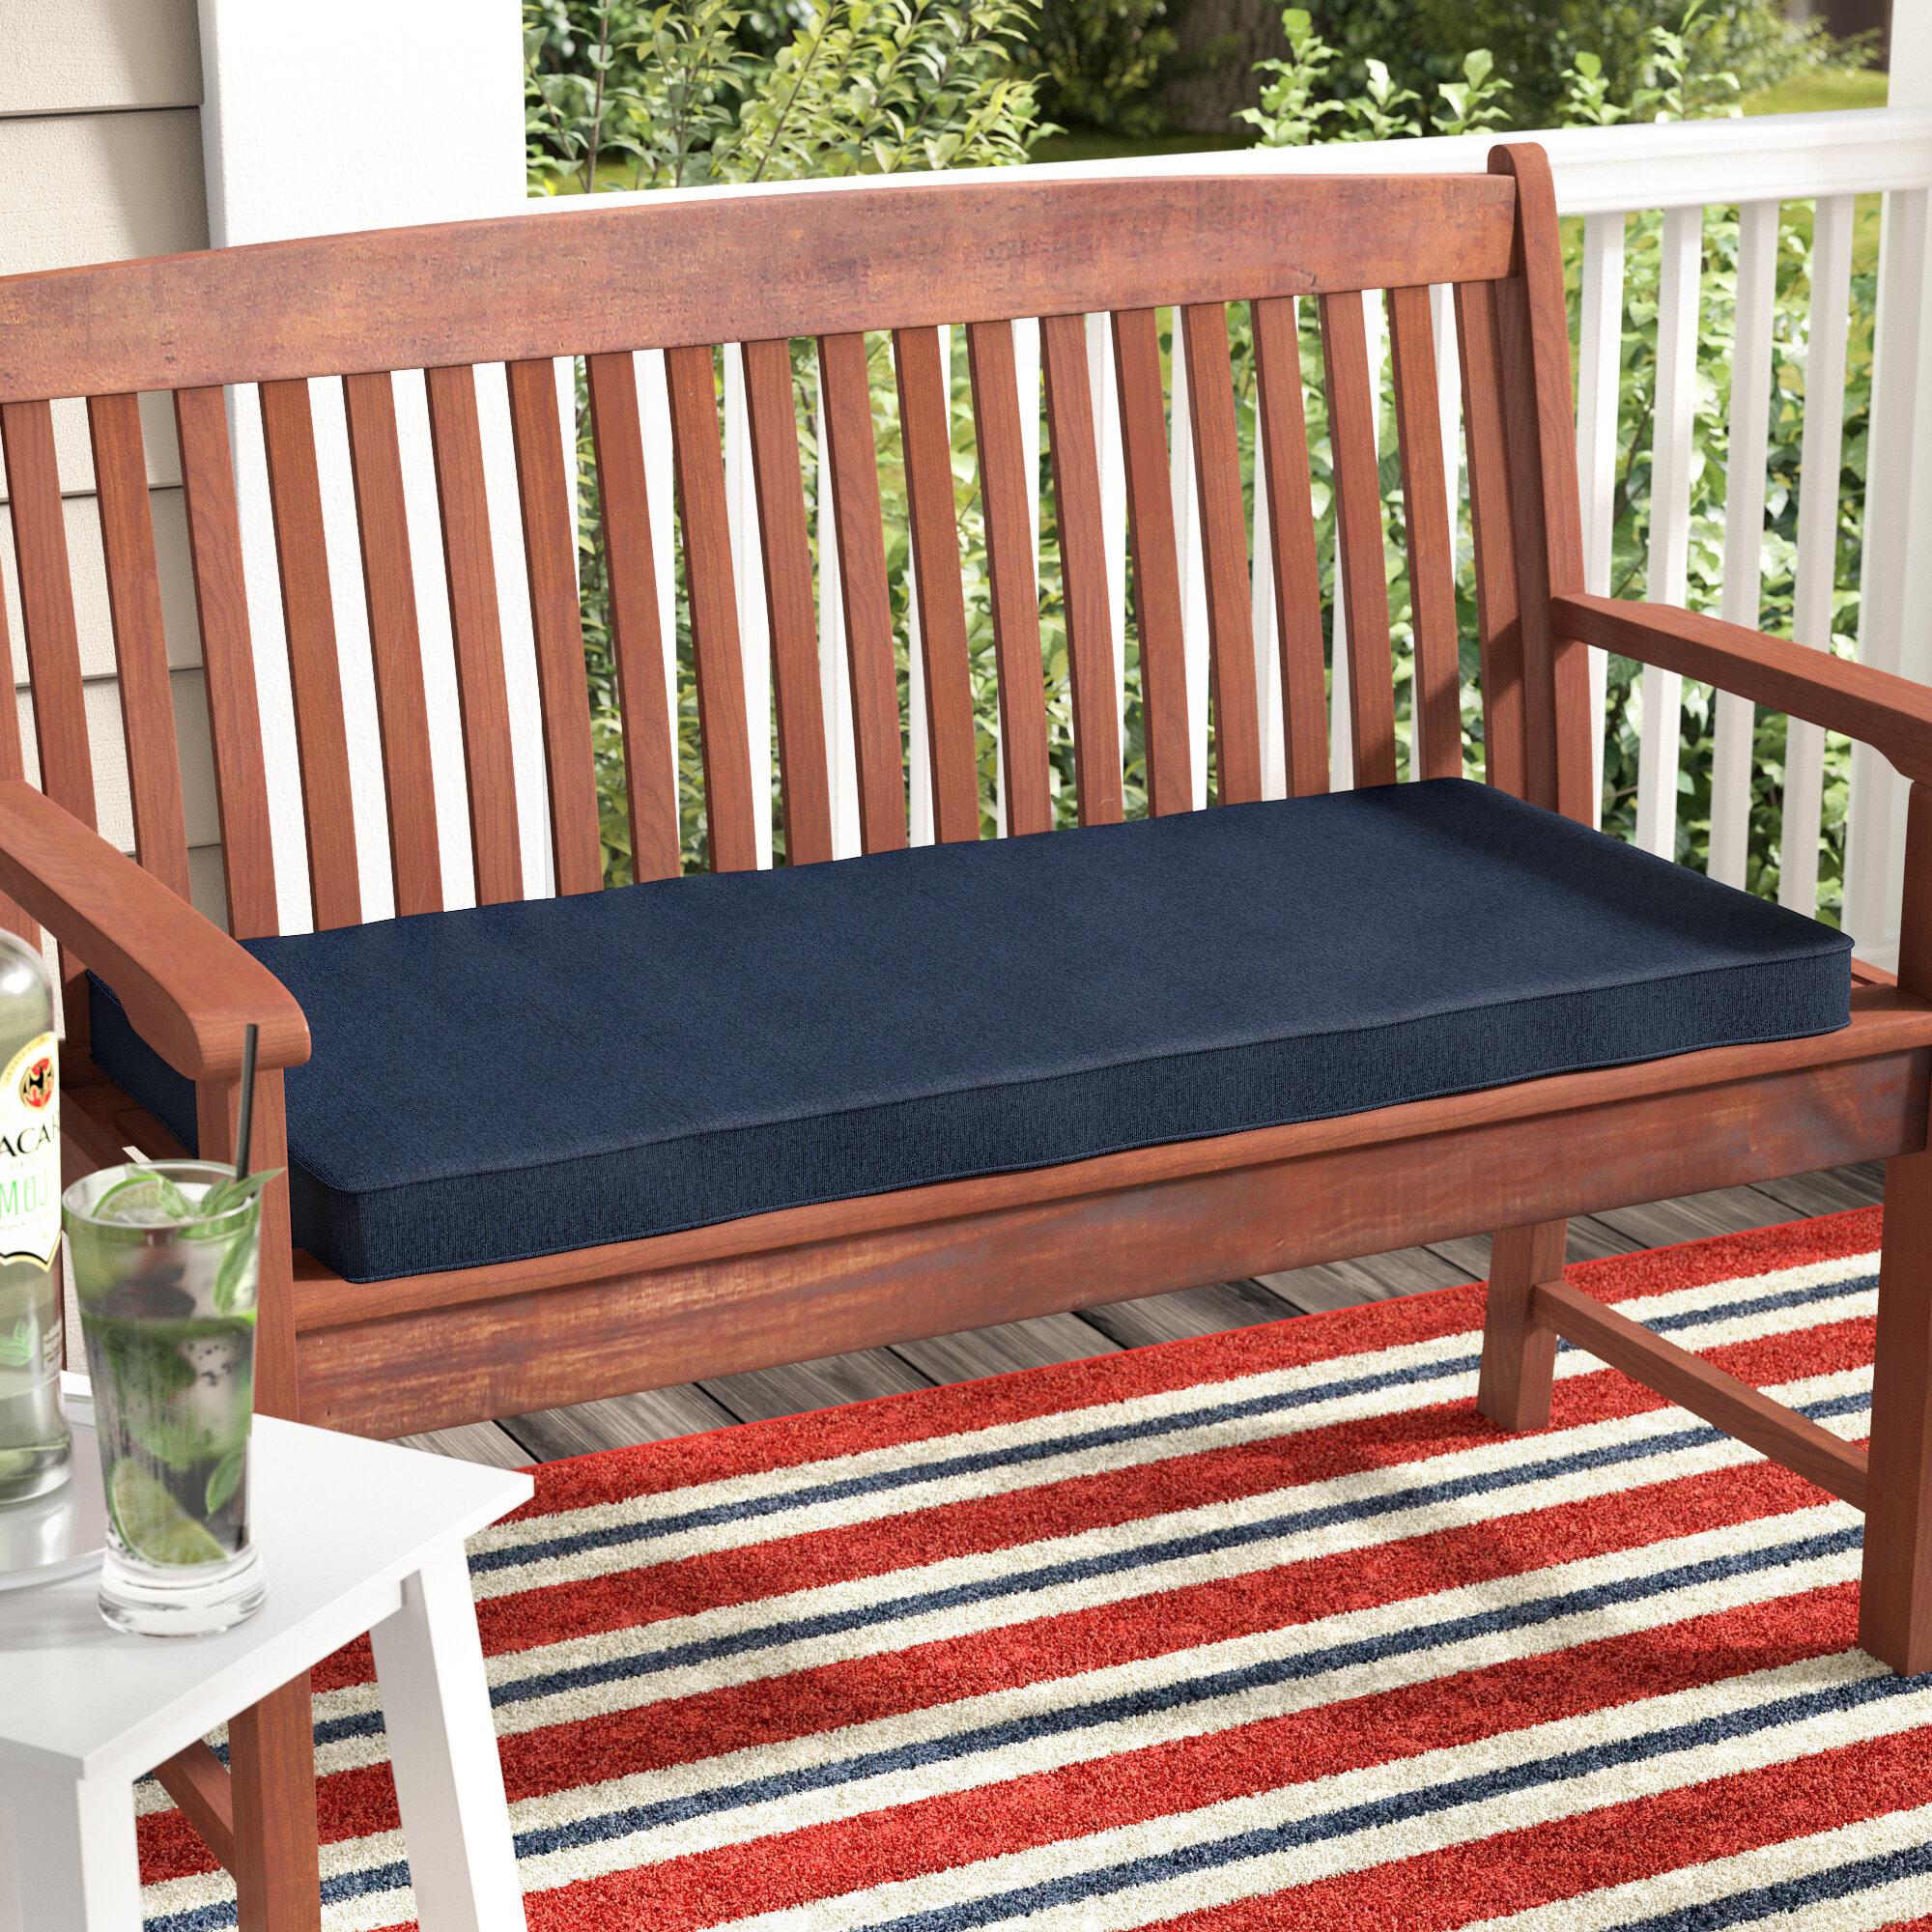 Breakwater Bay Outdoor Sunbrella Seat Cushion Reviews Wayfair